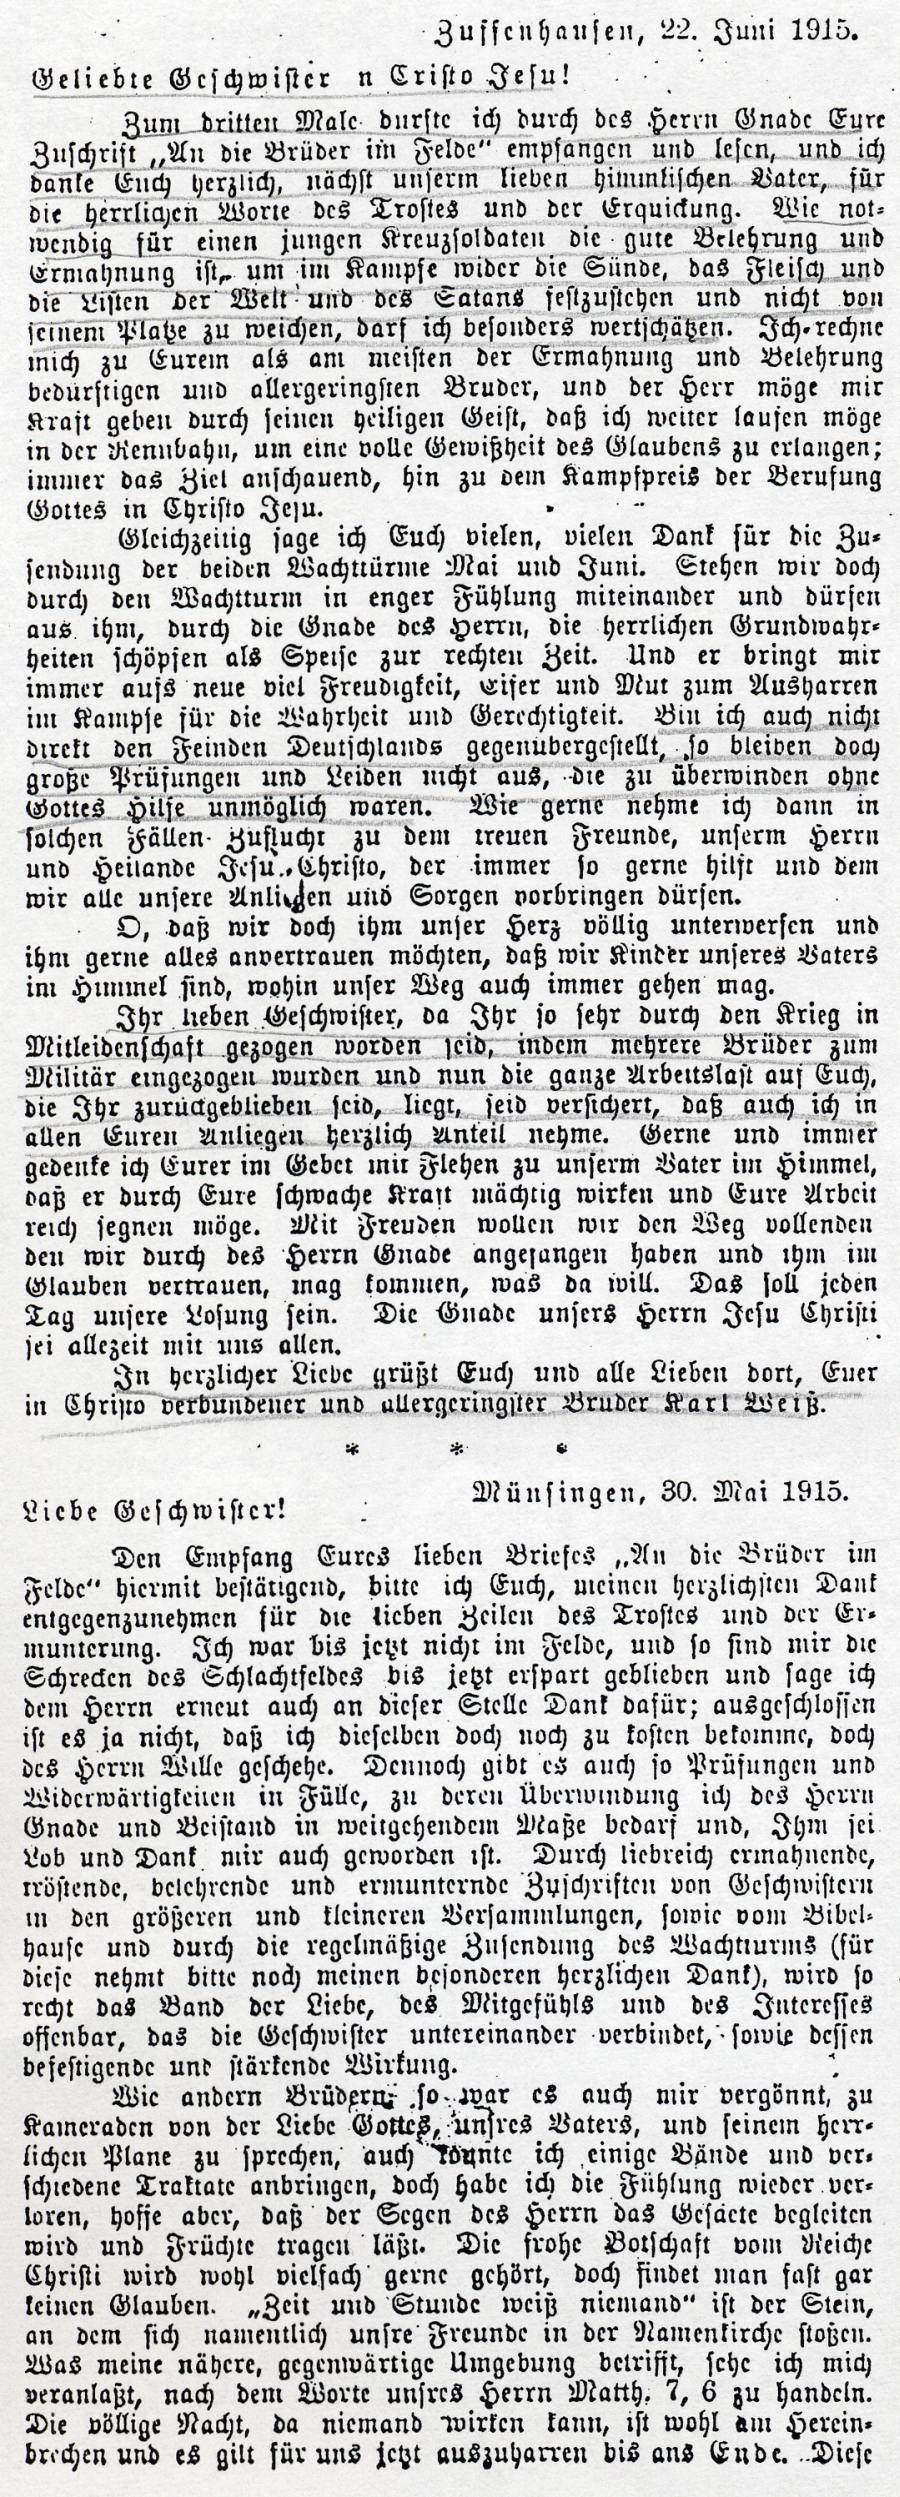 http://www.manfred-gebhard.de/File0015-1.jpg